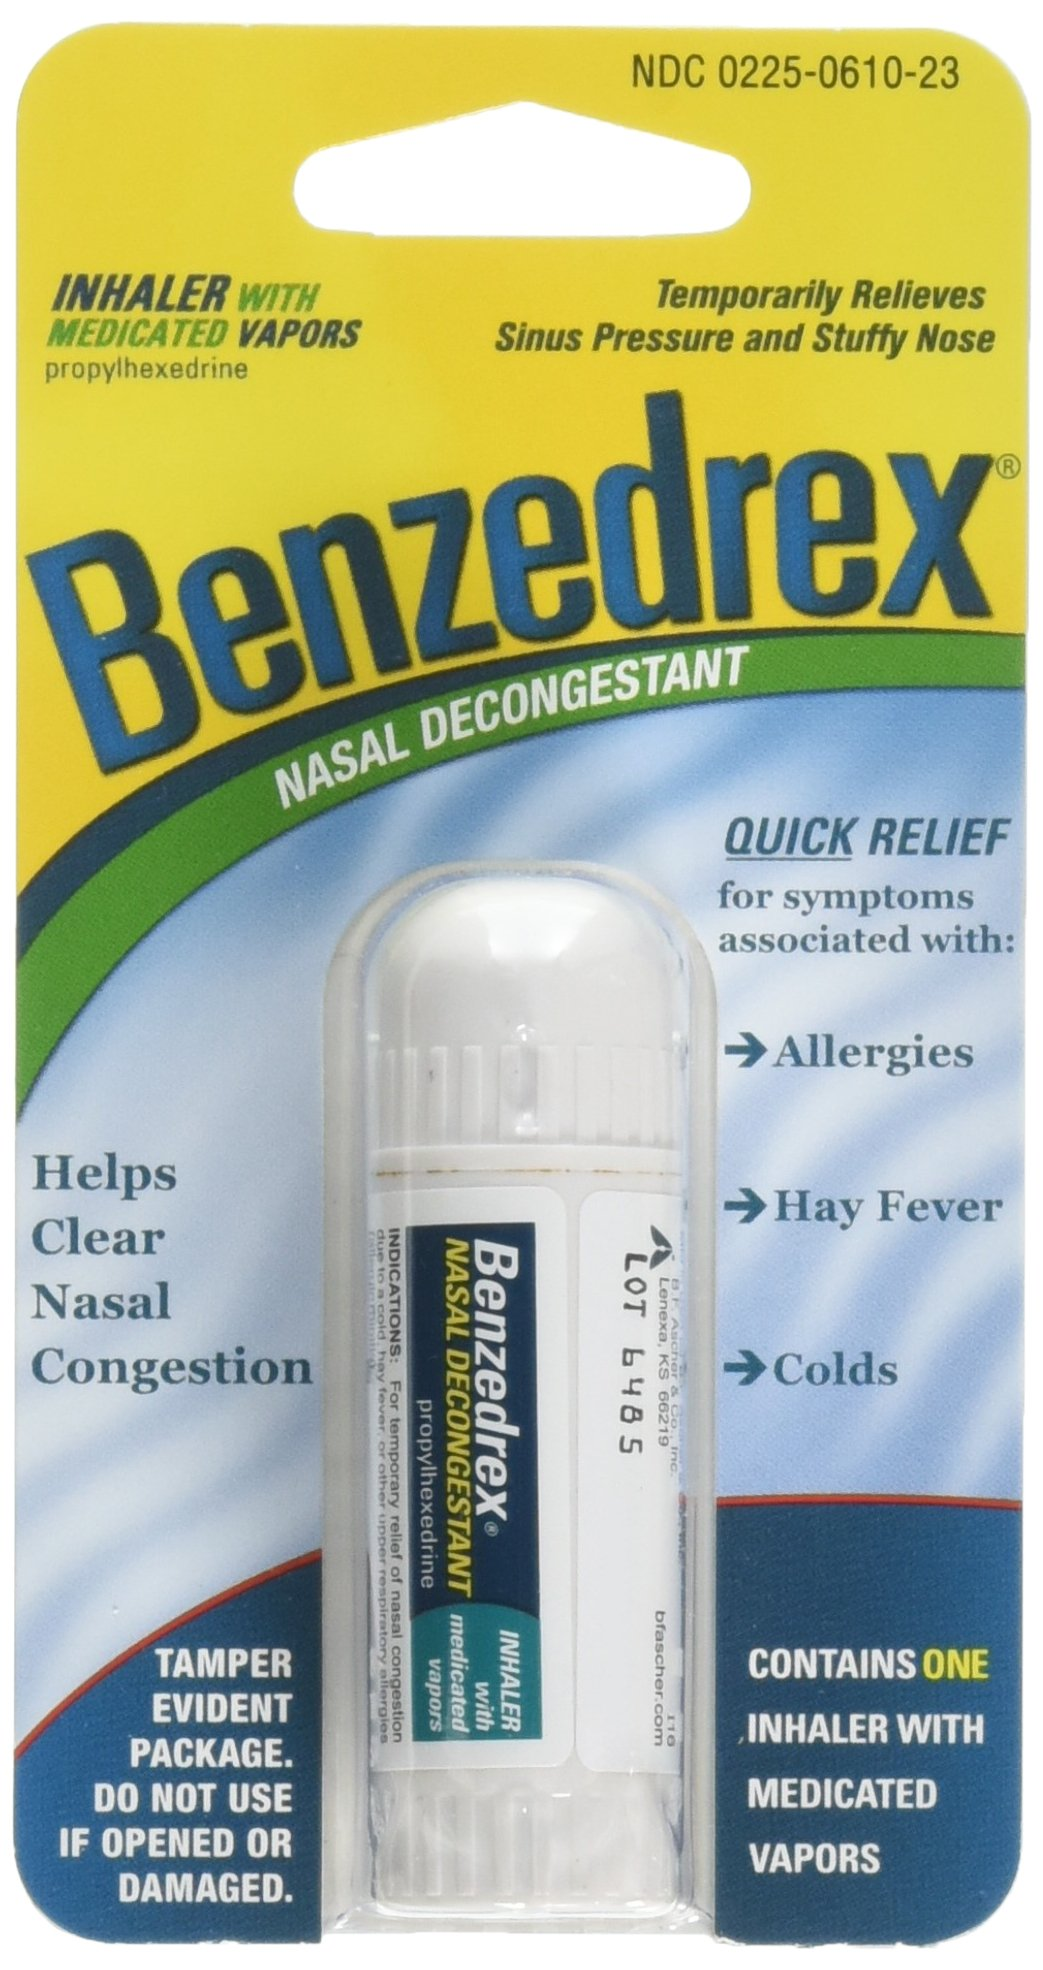 Benzedrex Inhaler Propylhexedrine Nasal Decongestant - 1ea(Pack of 6)